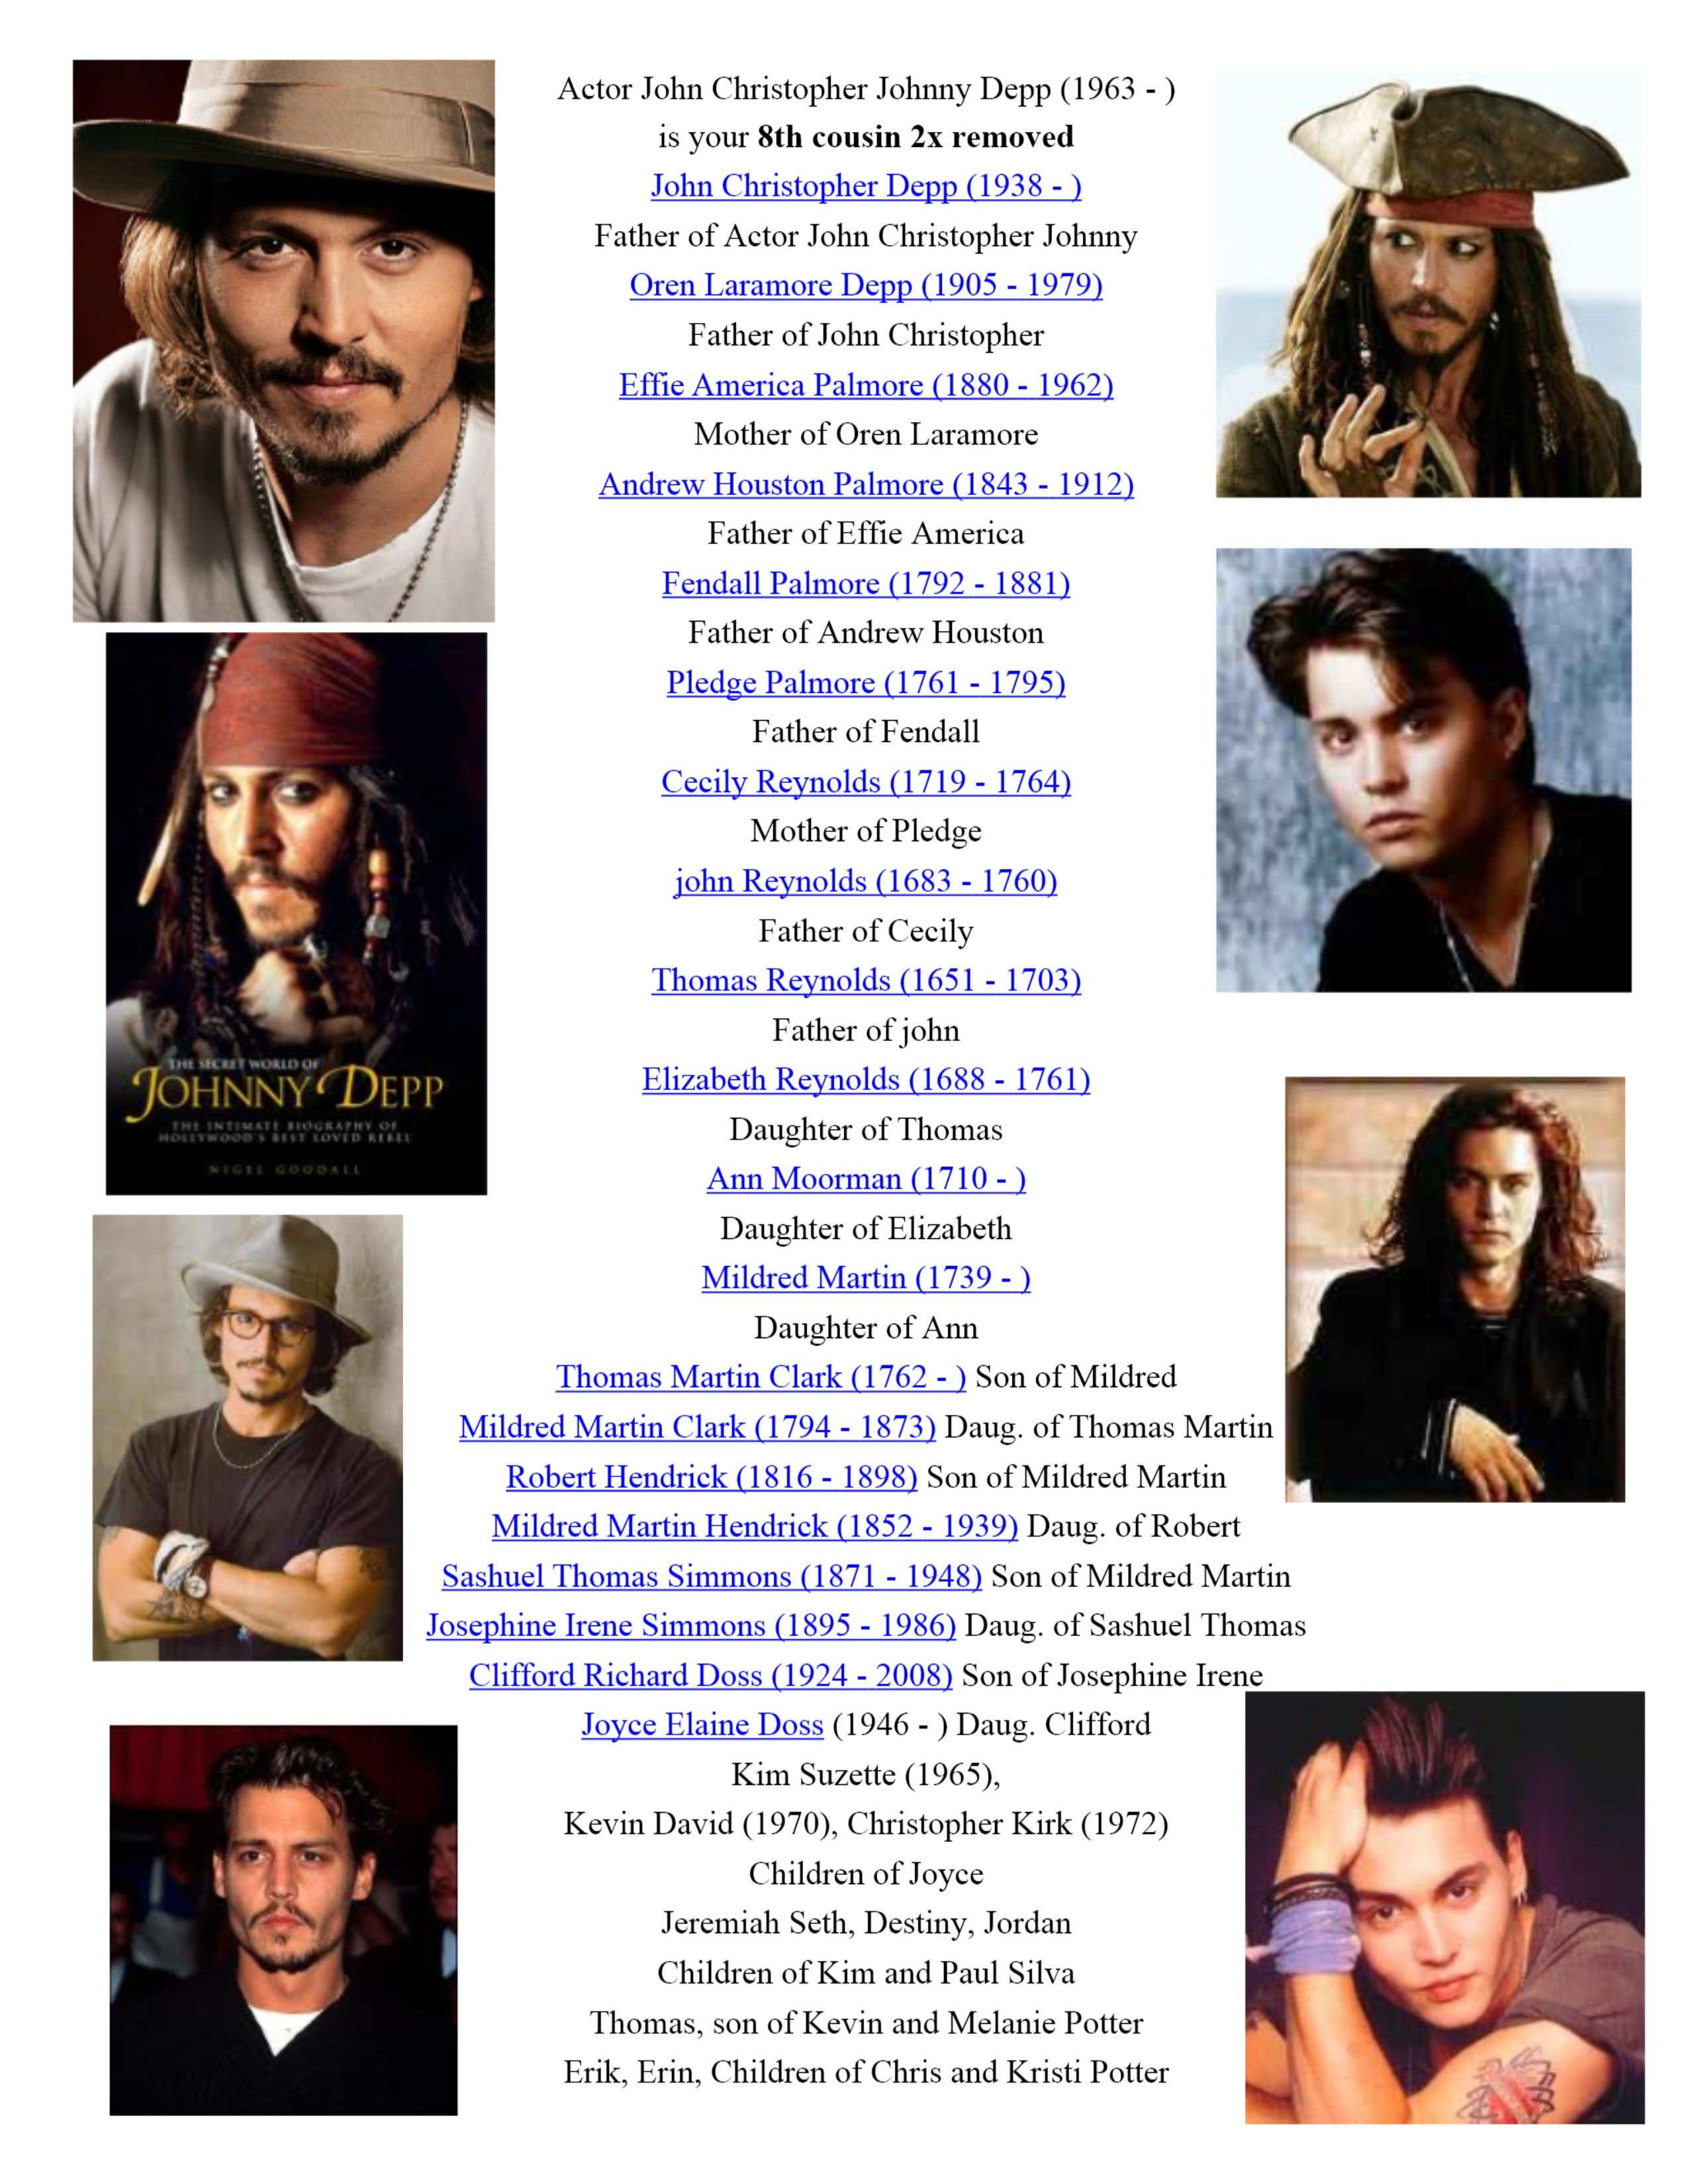 1963 Actor Johnny Depp 8th cousin